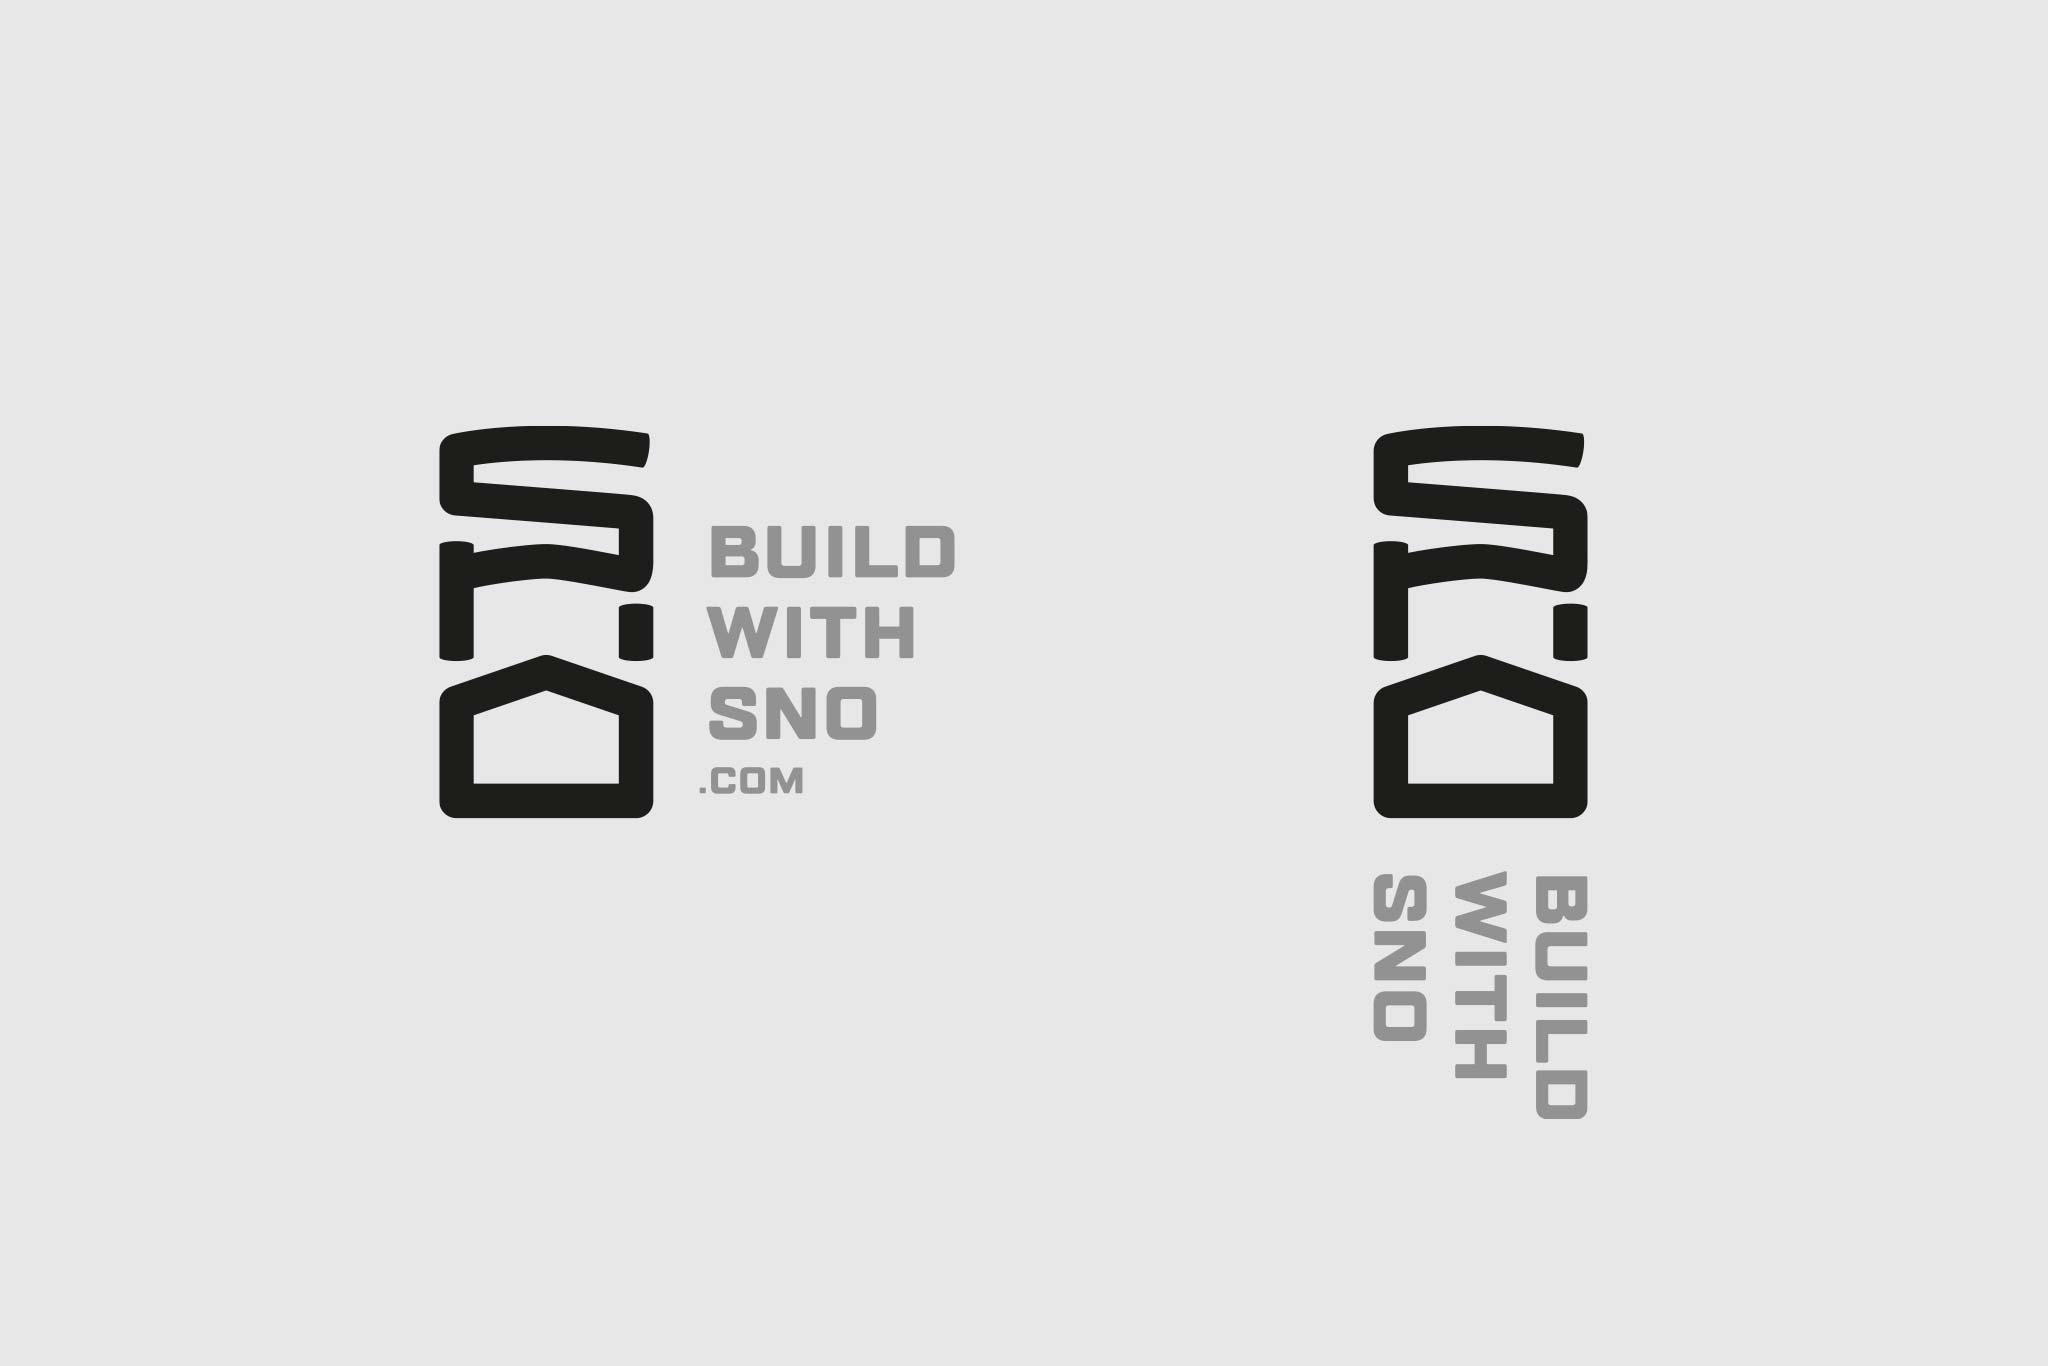 build-wth-sno-branding_8